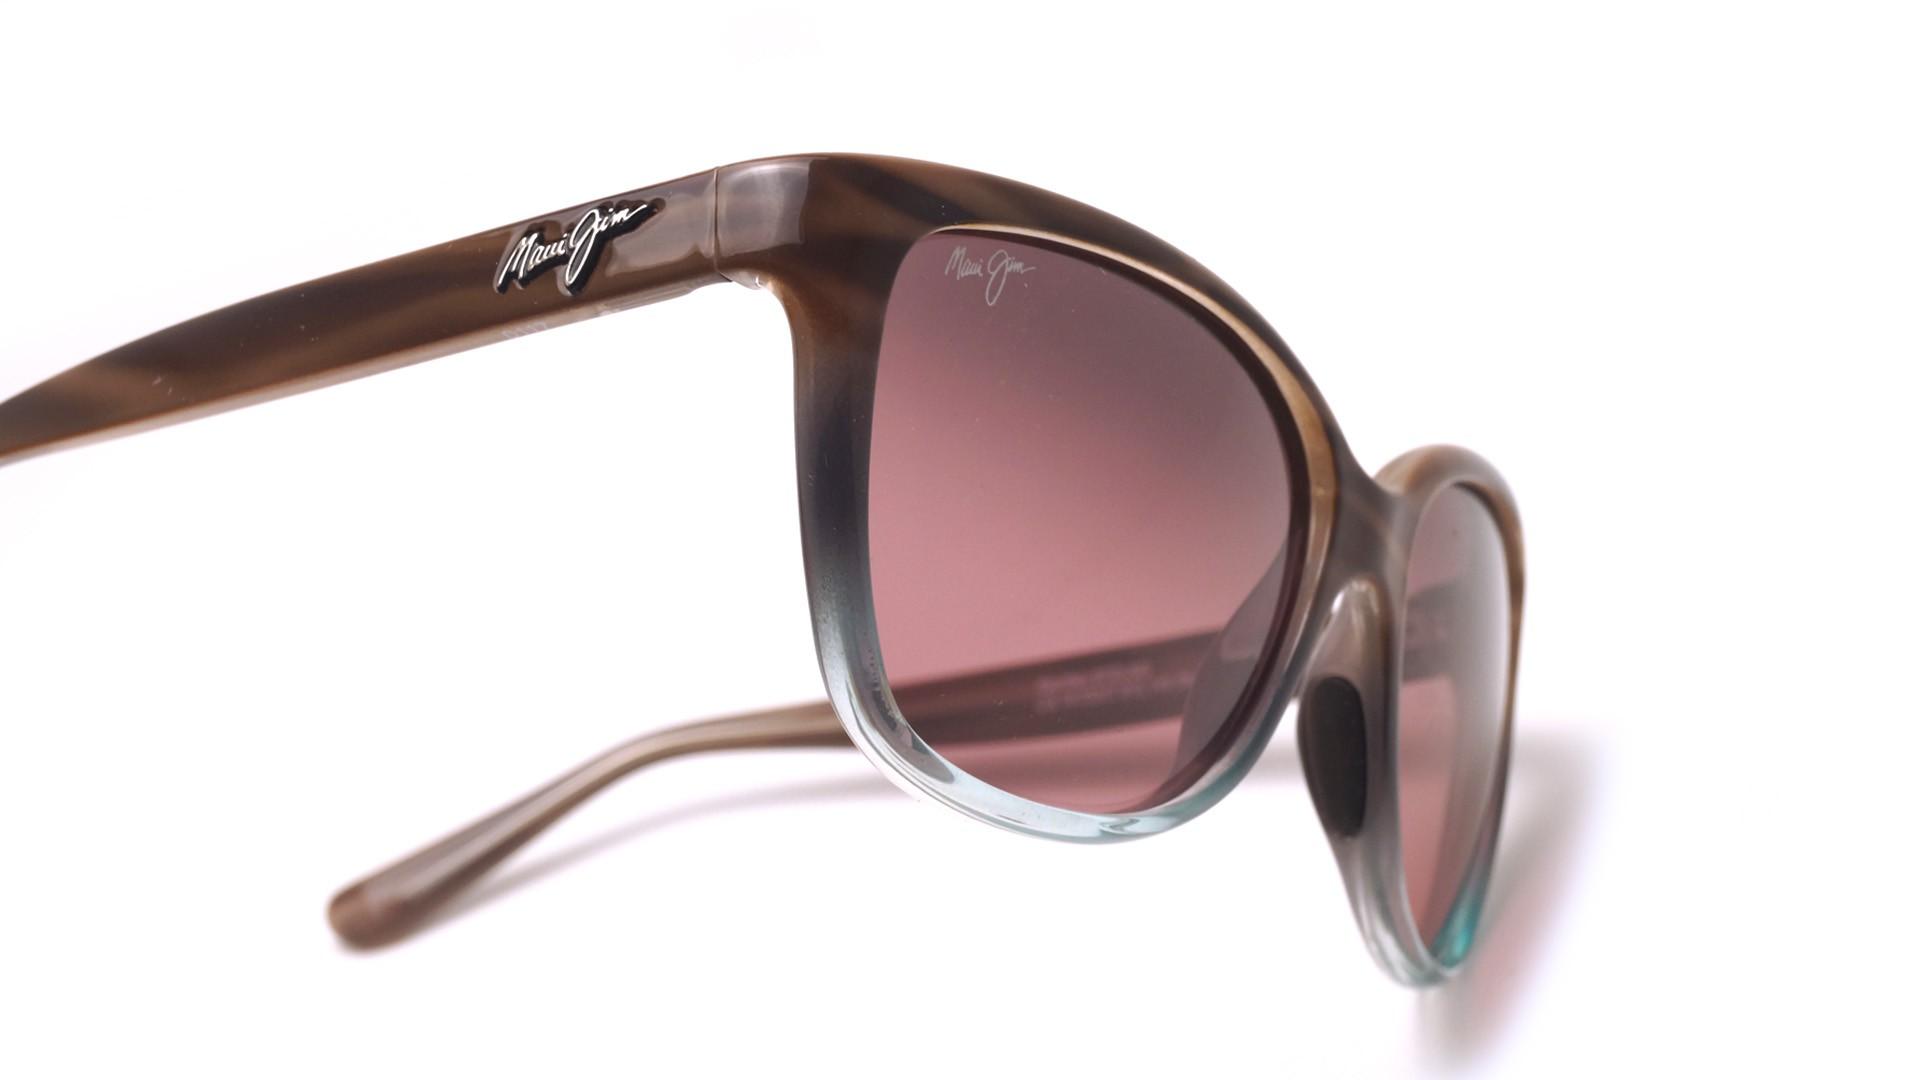 5682f564fce6 Sunglasses Maui Jim Starfish Tortoise Maui Rose RS744 22B 56-15 Medium  Polarized Gradient